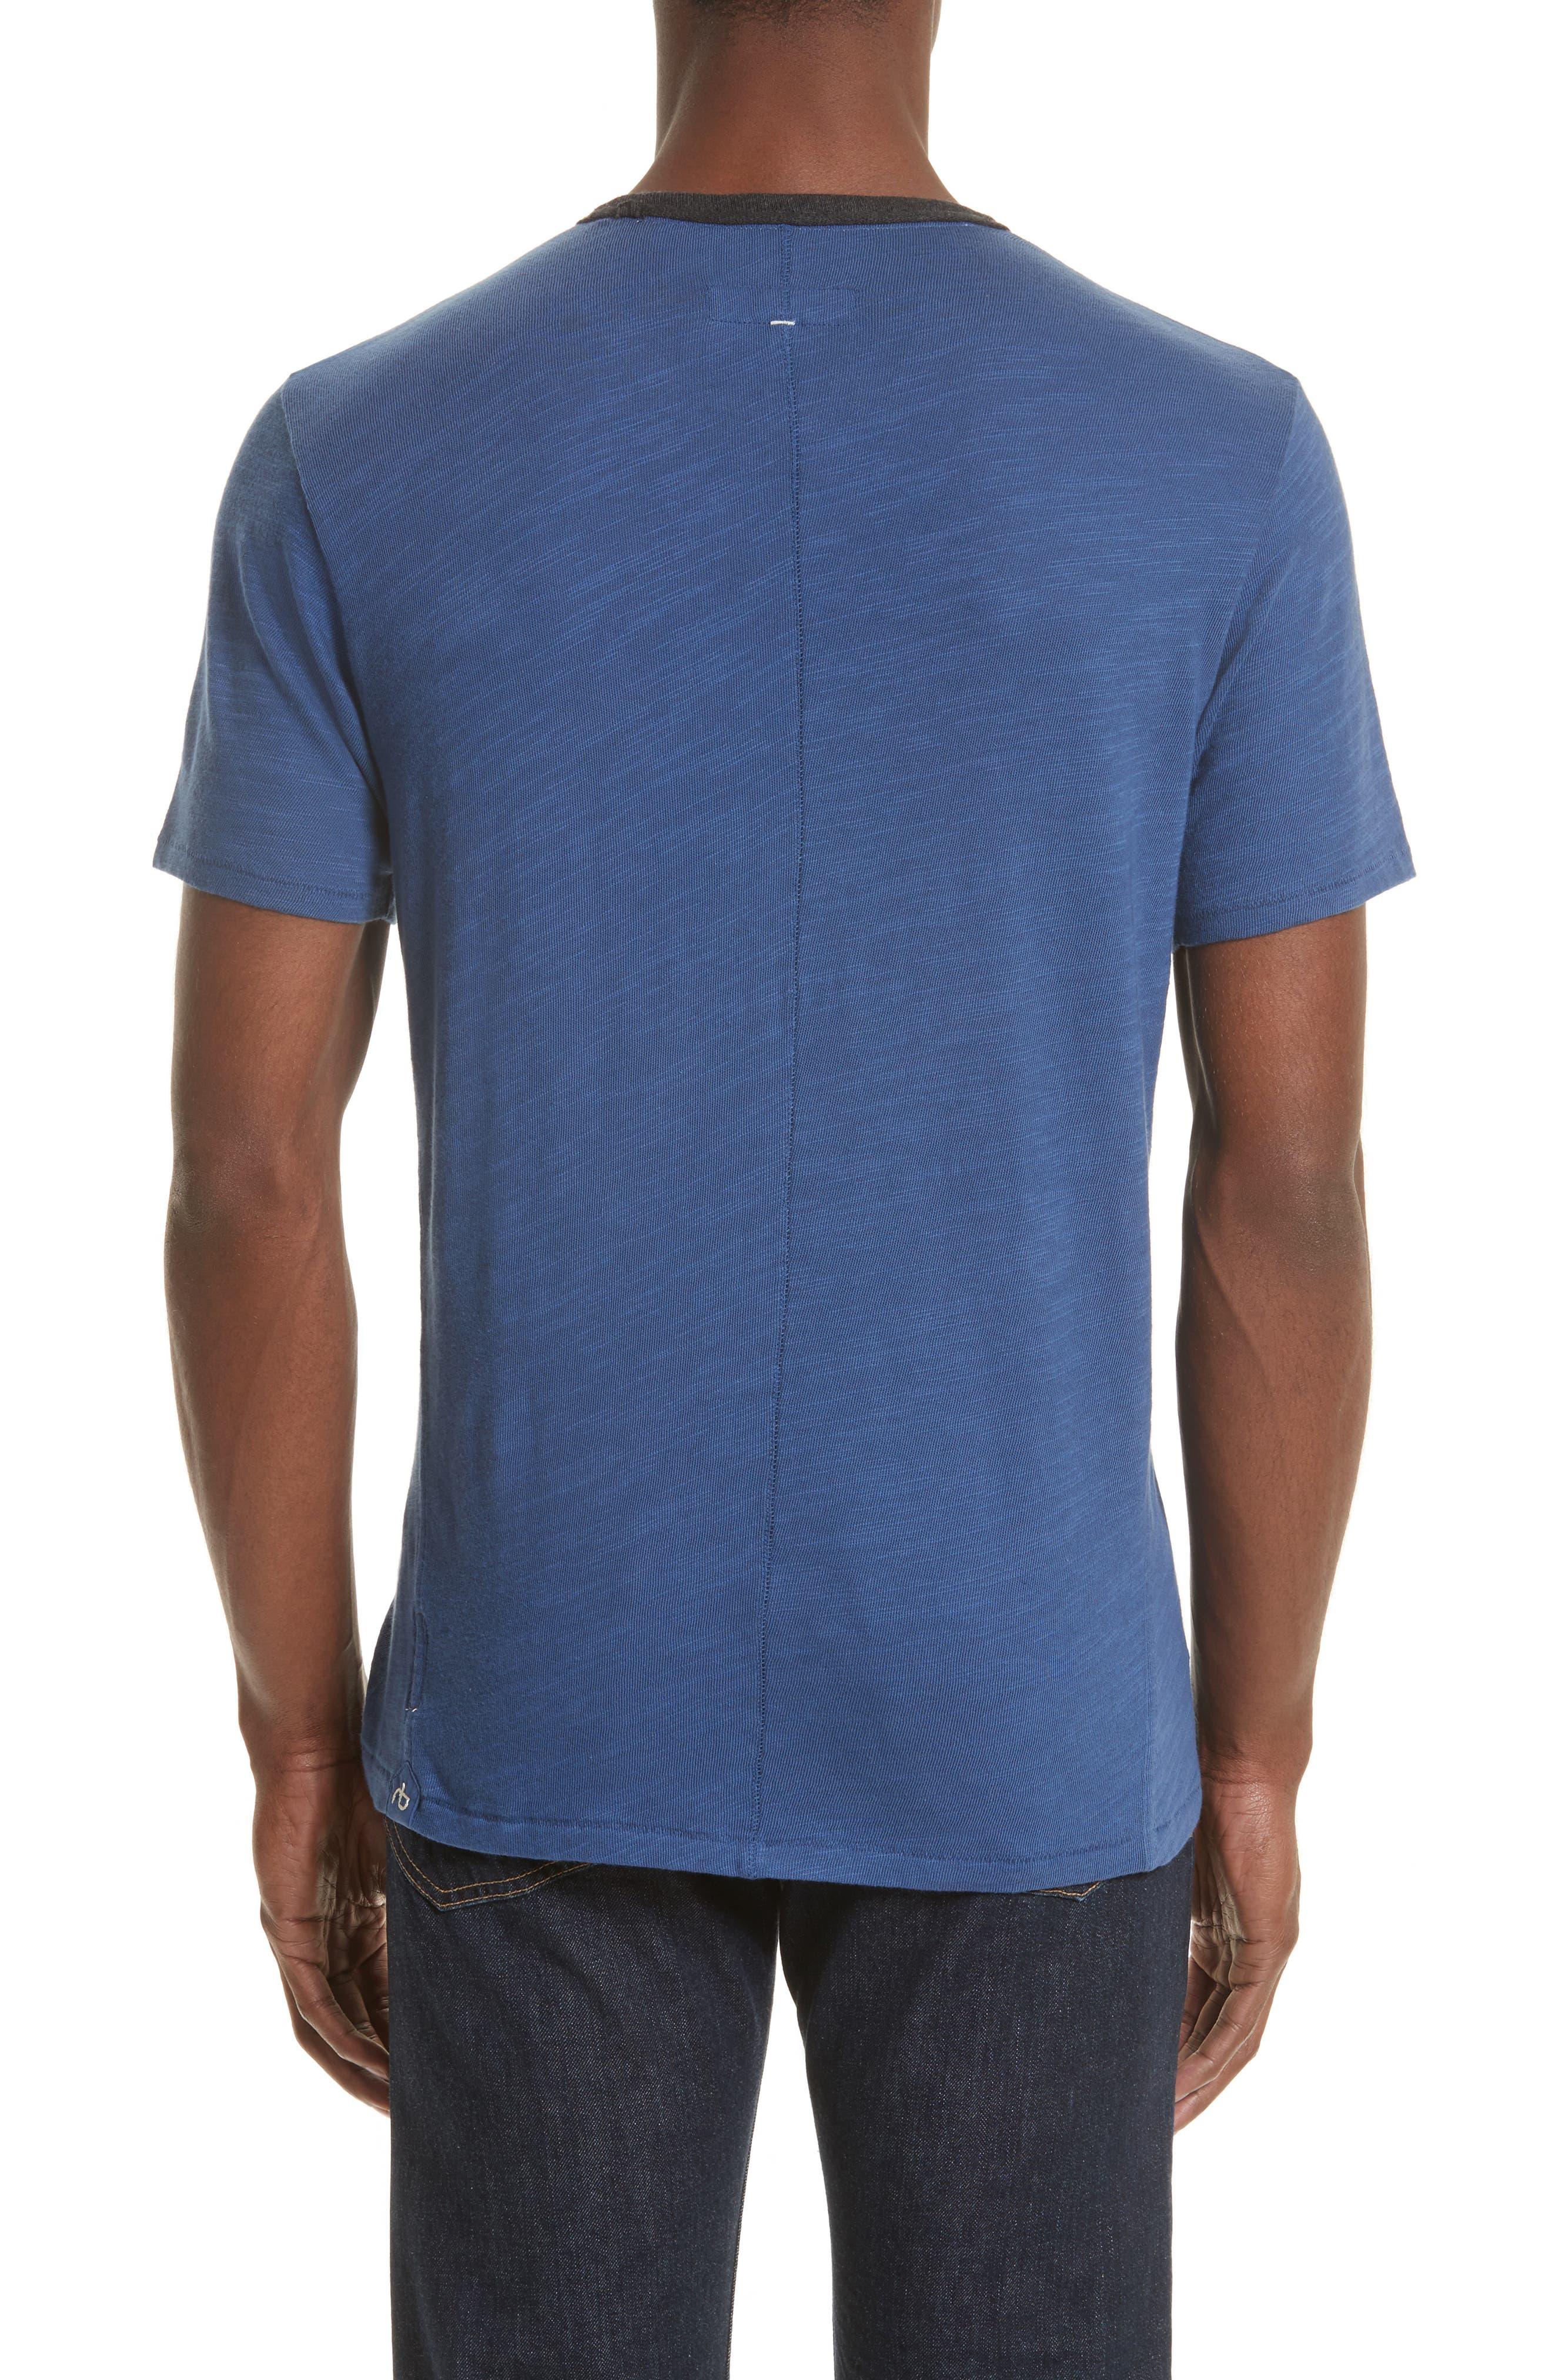 Alternate Image 2  - rag & bone Slub Cotton Jersey T-Shirt